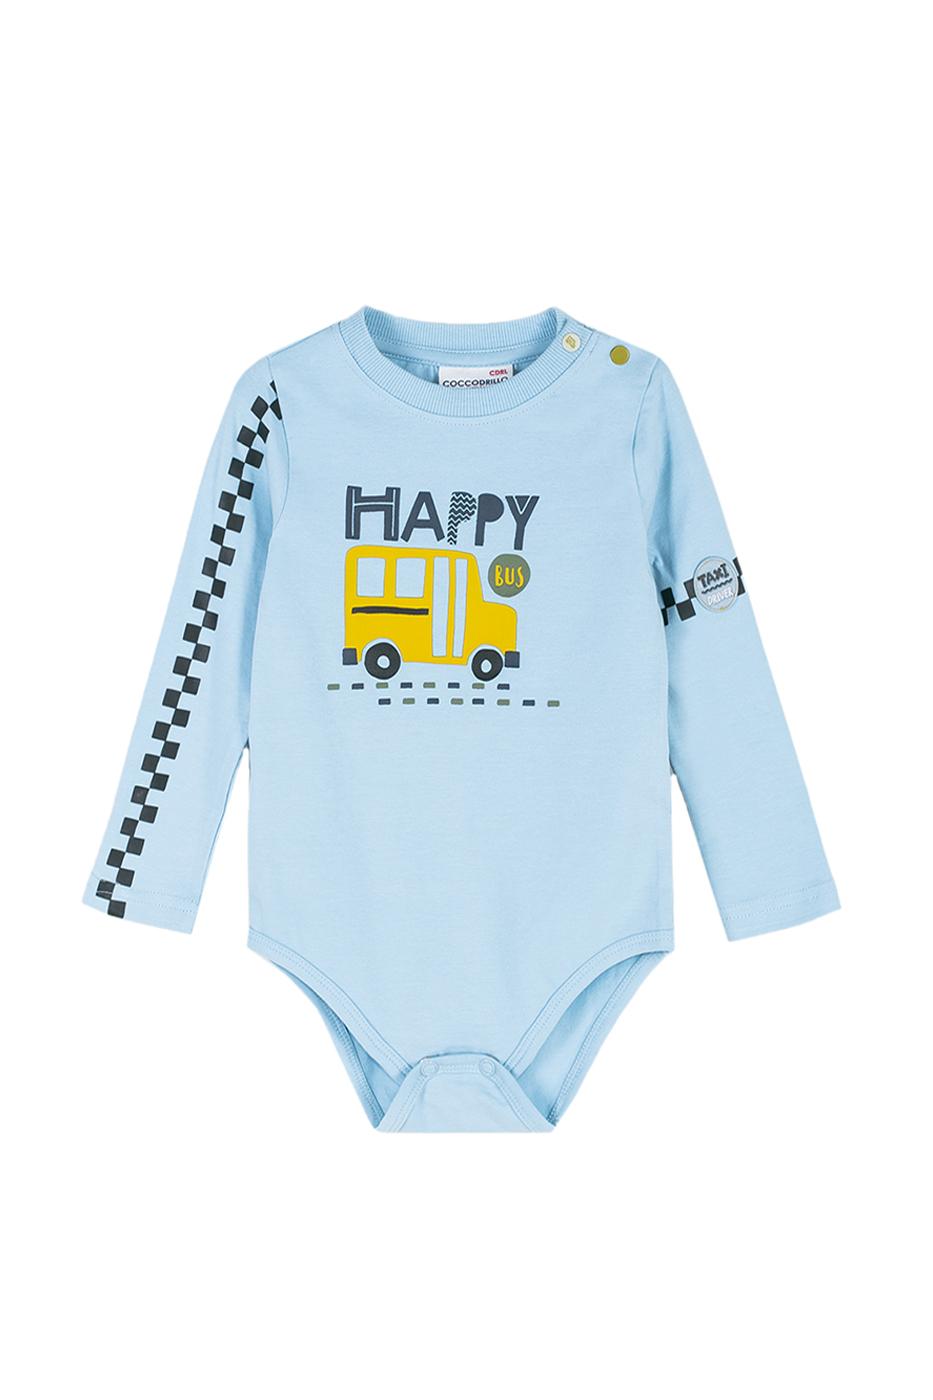 Купить Z191121M1TAX, Боди для мальчика Coccodrillo, 80 р-р, цв.голубой, Боди для новорожденных